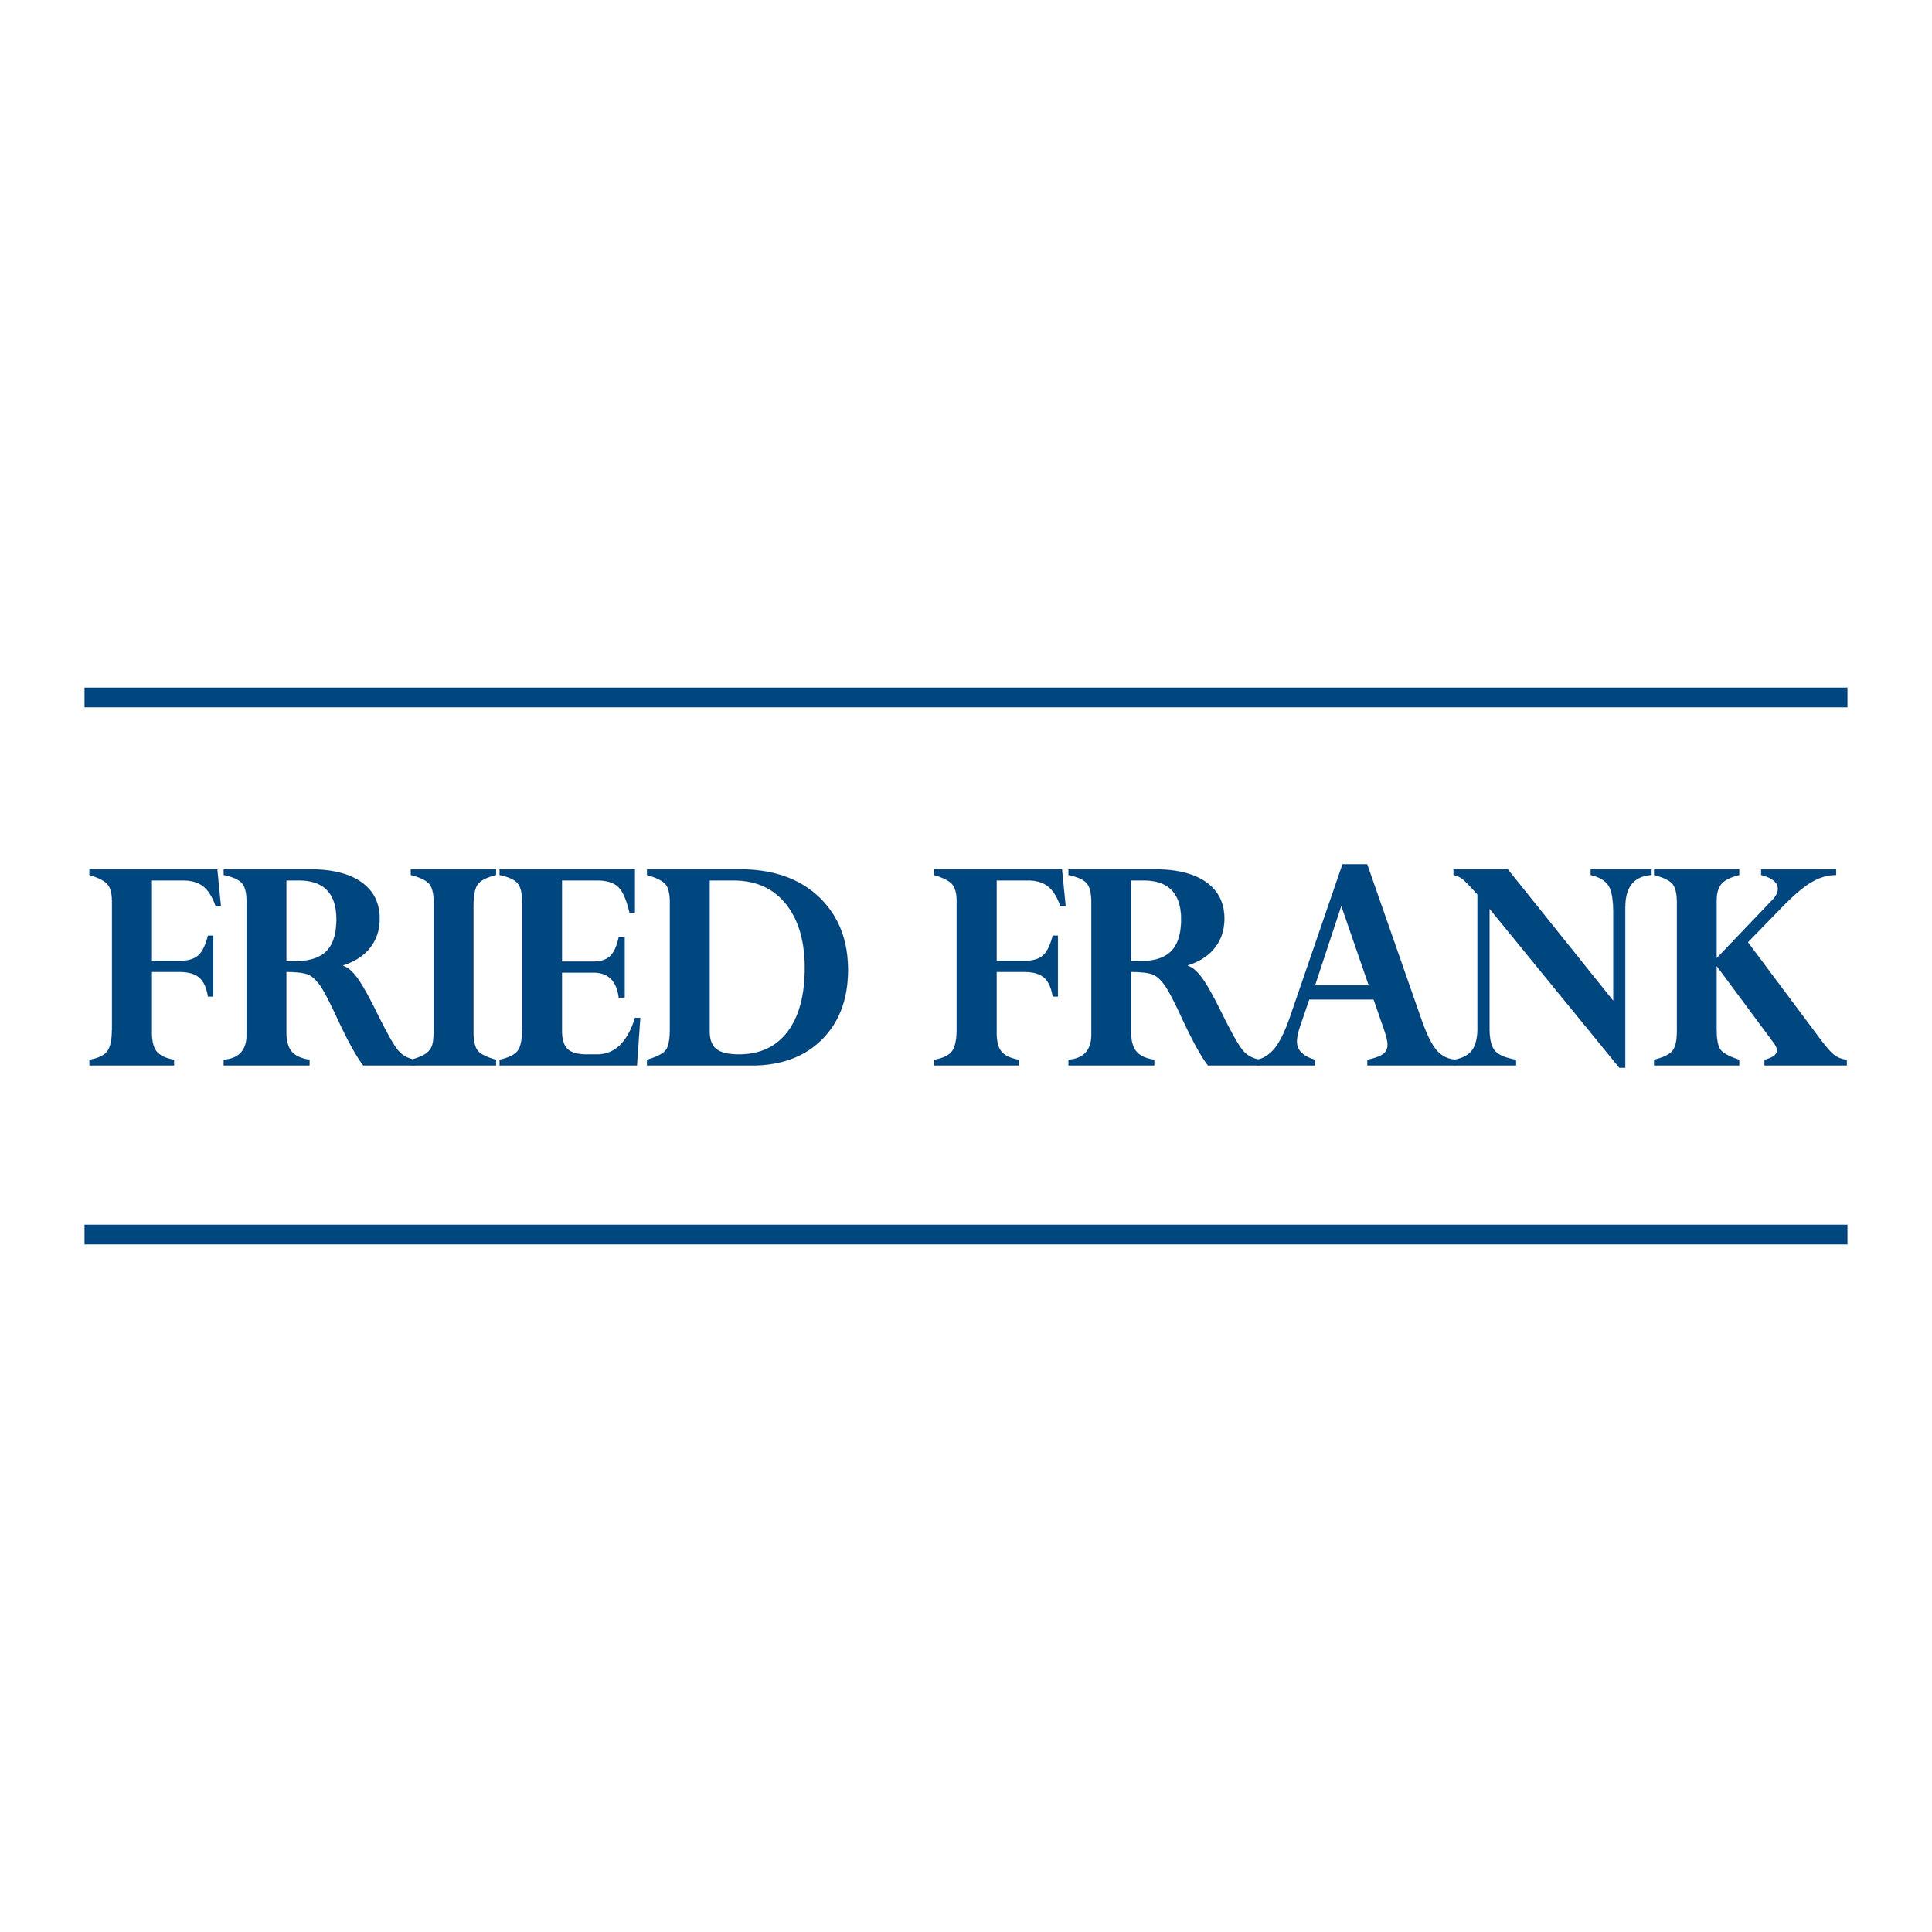 fried frank-01.jpg